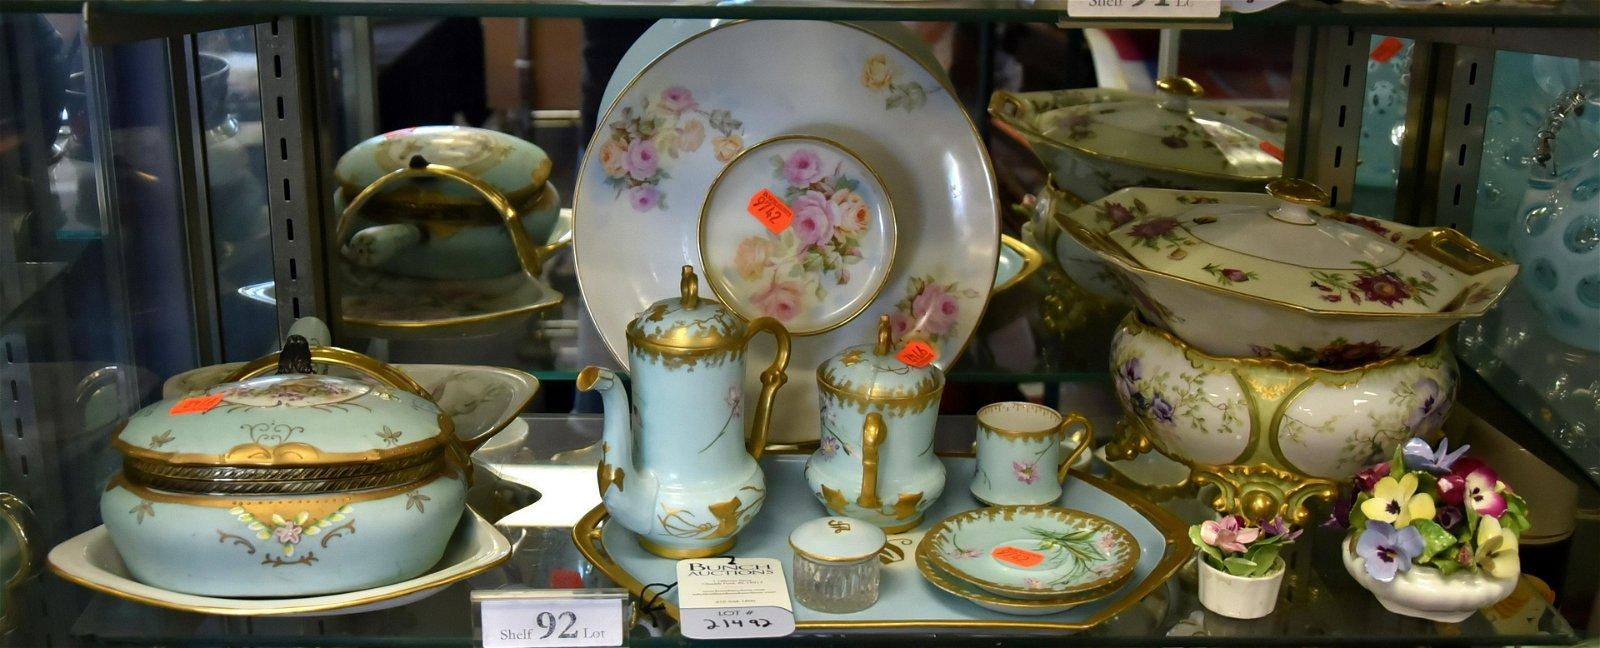 Shelf #92 - Porcelain Tea Set, Bowls and Dishes